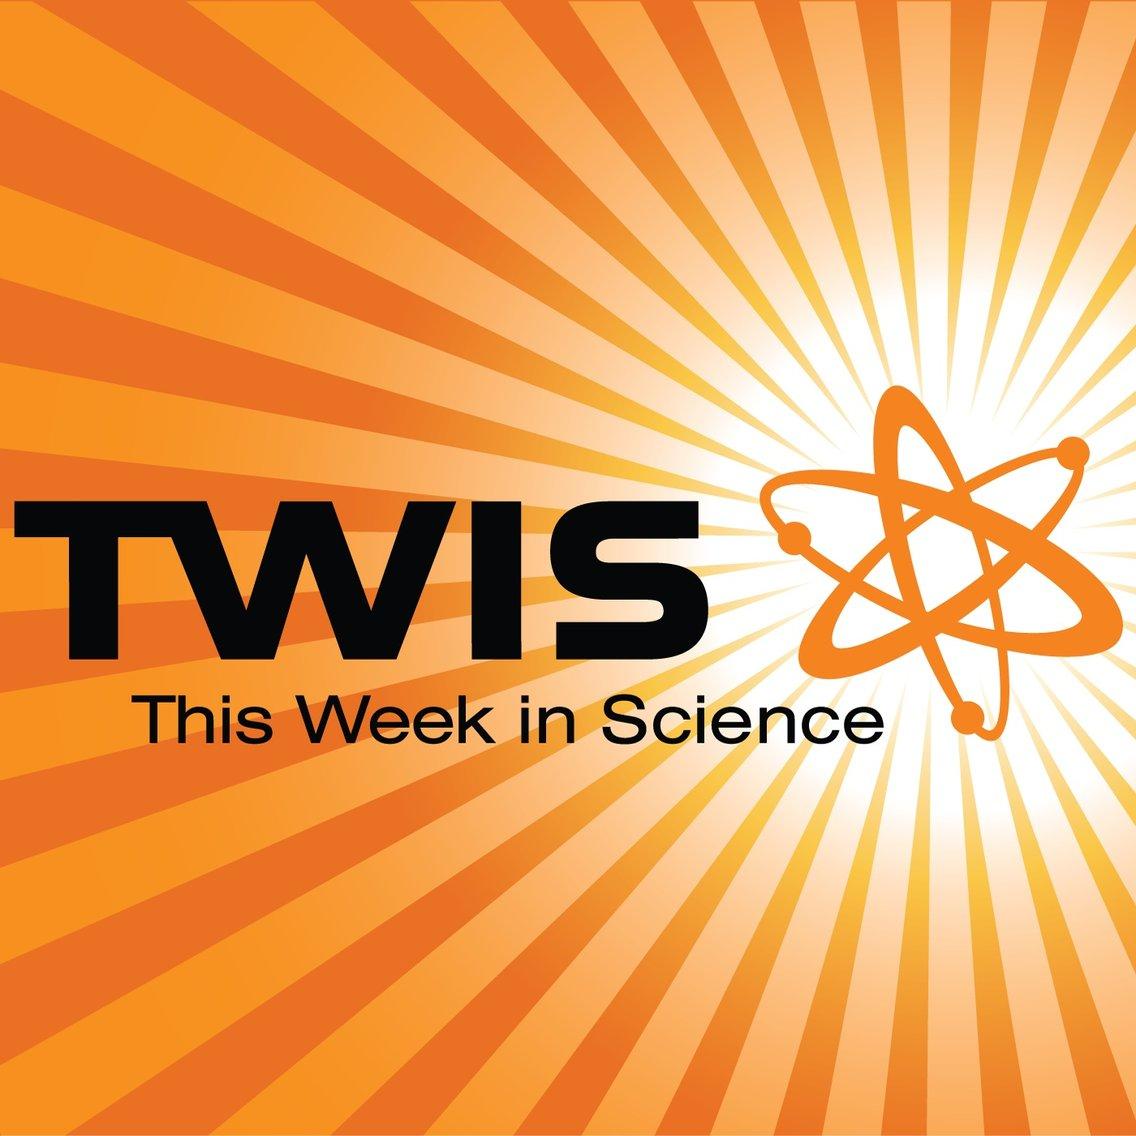 This Week in Science (TWIS) - immagine di copertina